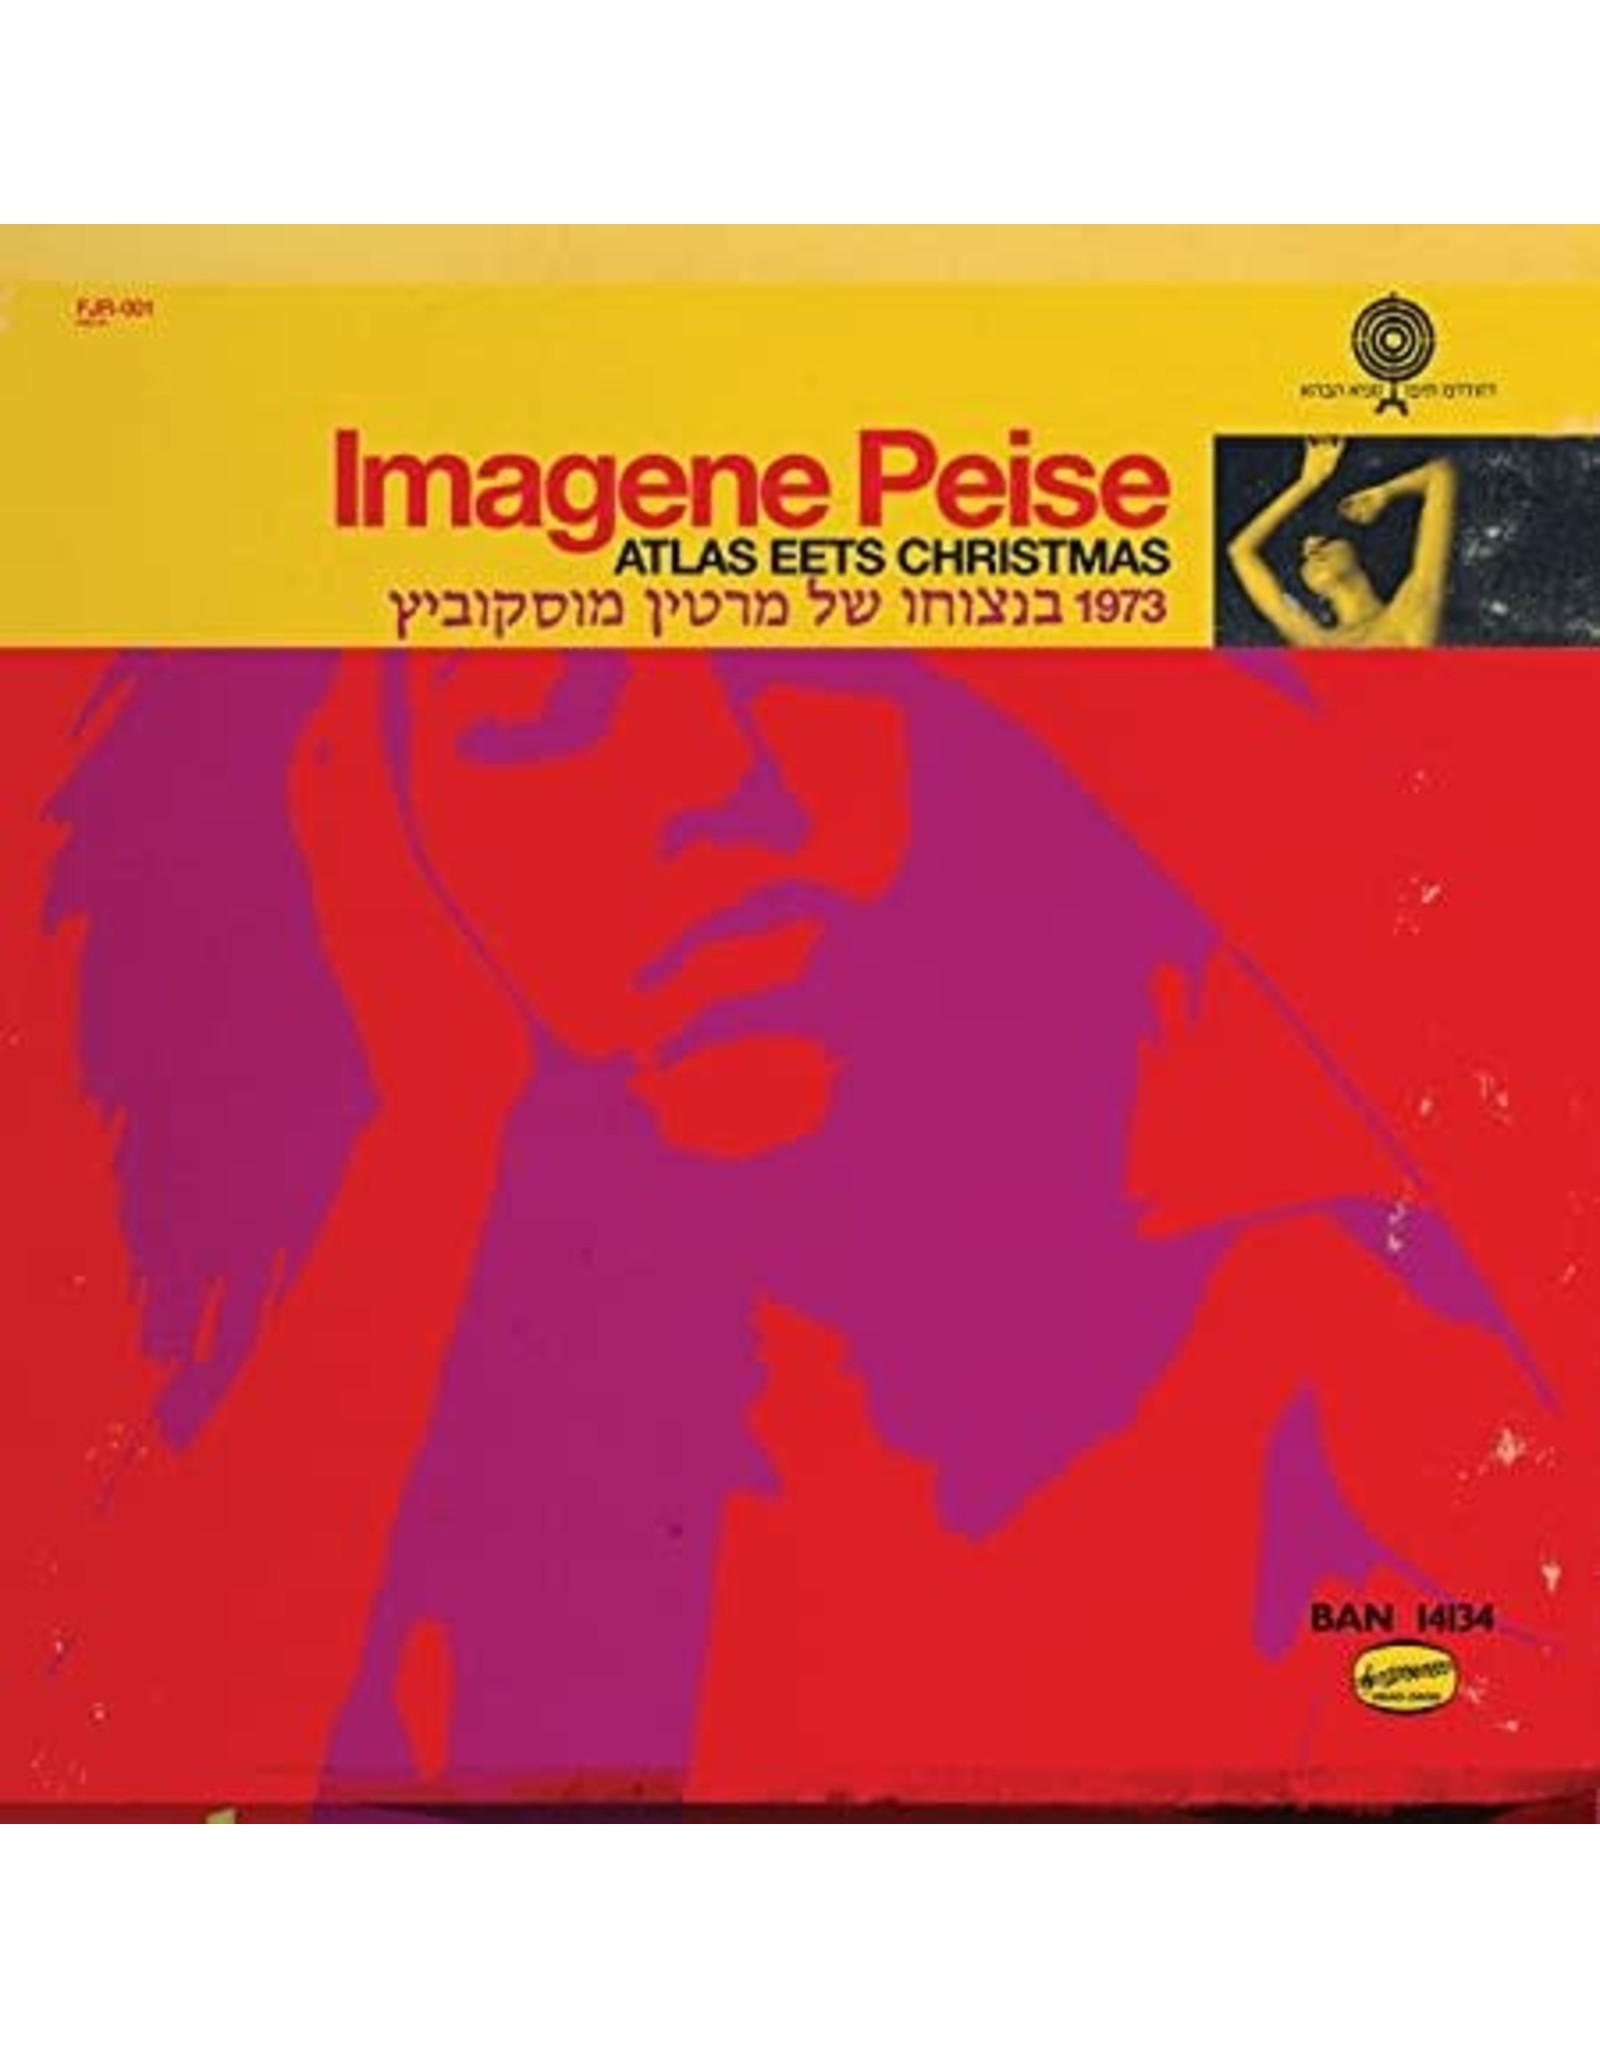 New Vinyl Flaming Lips - Imagine Peise: Atlas Eets Christmas LP